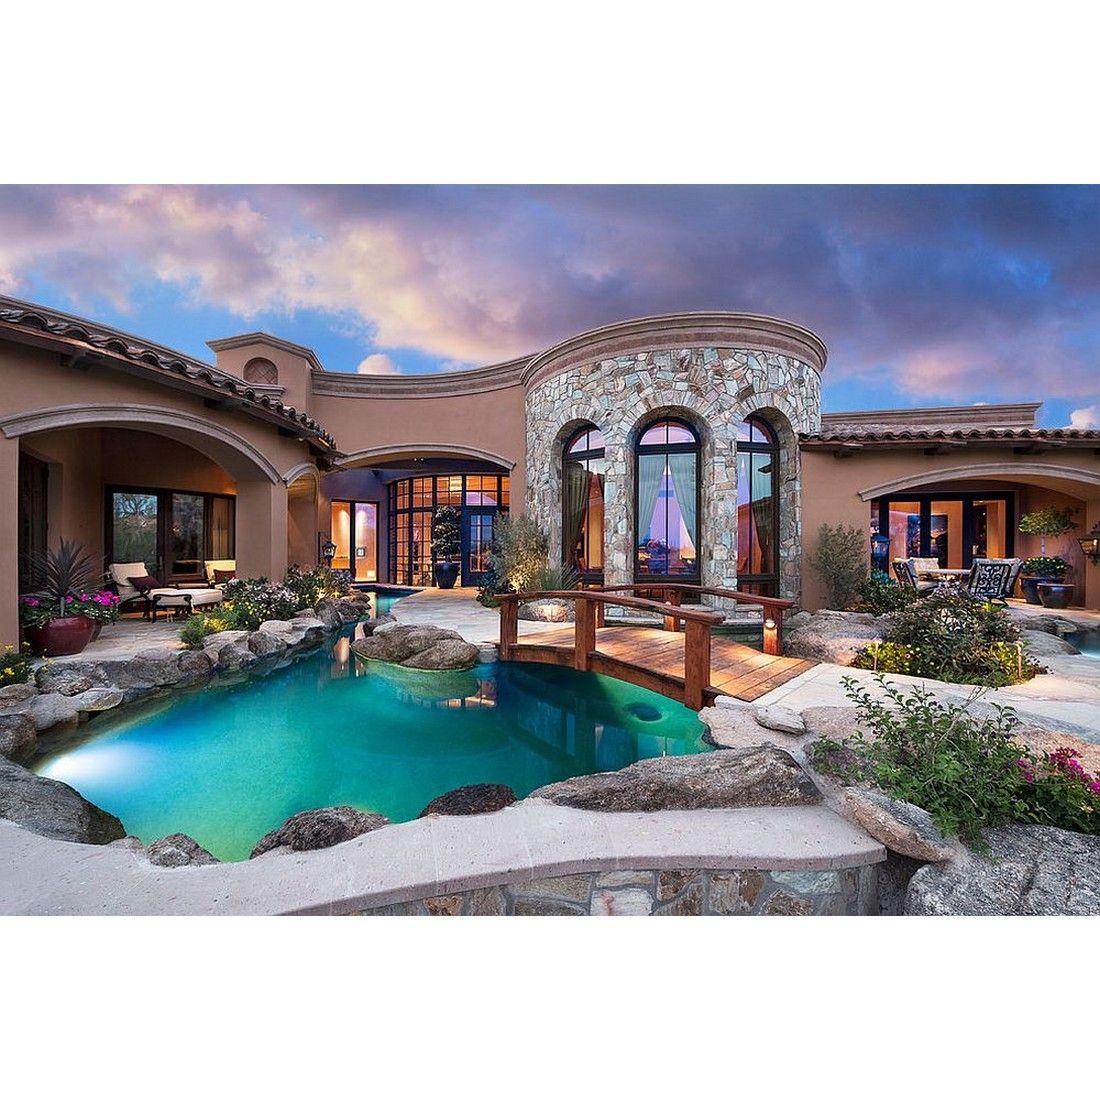 Perfect lighting create a dramatic pool. #rumahkupool | Exterior ...